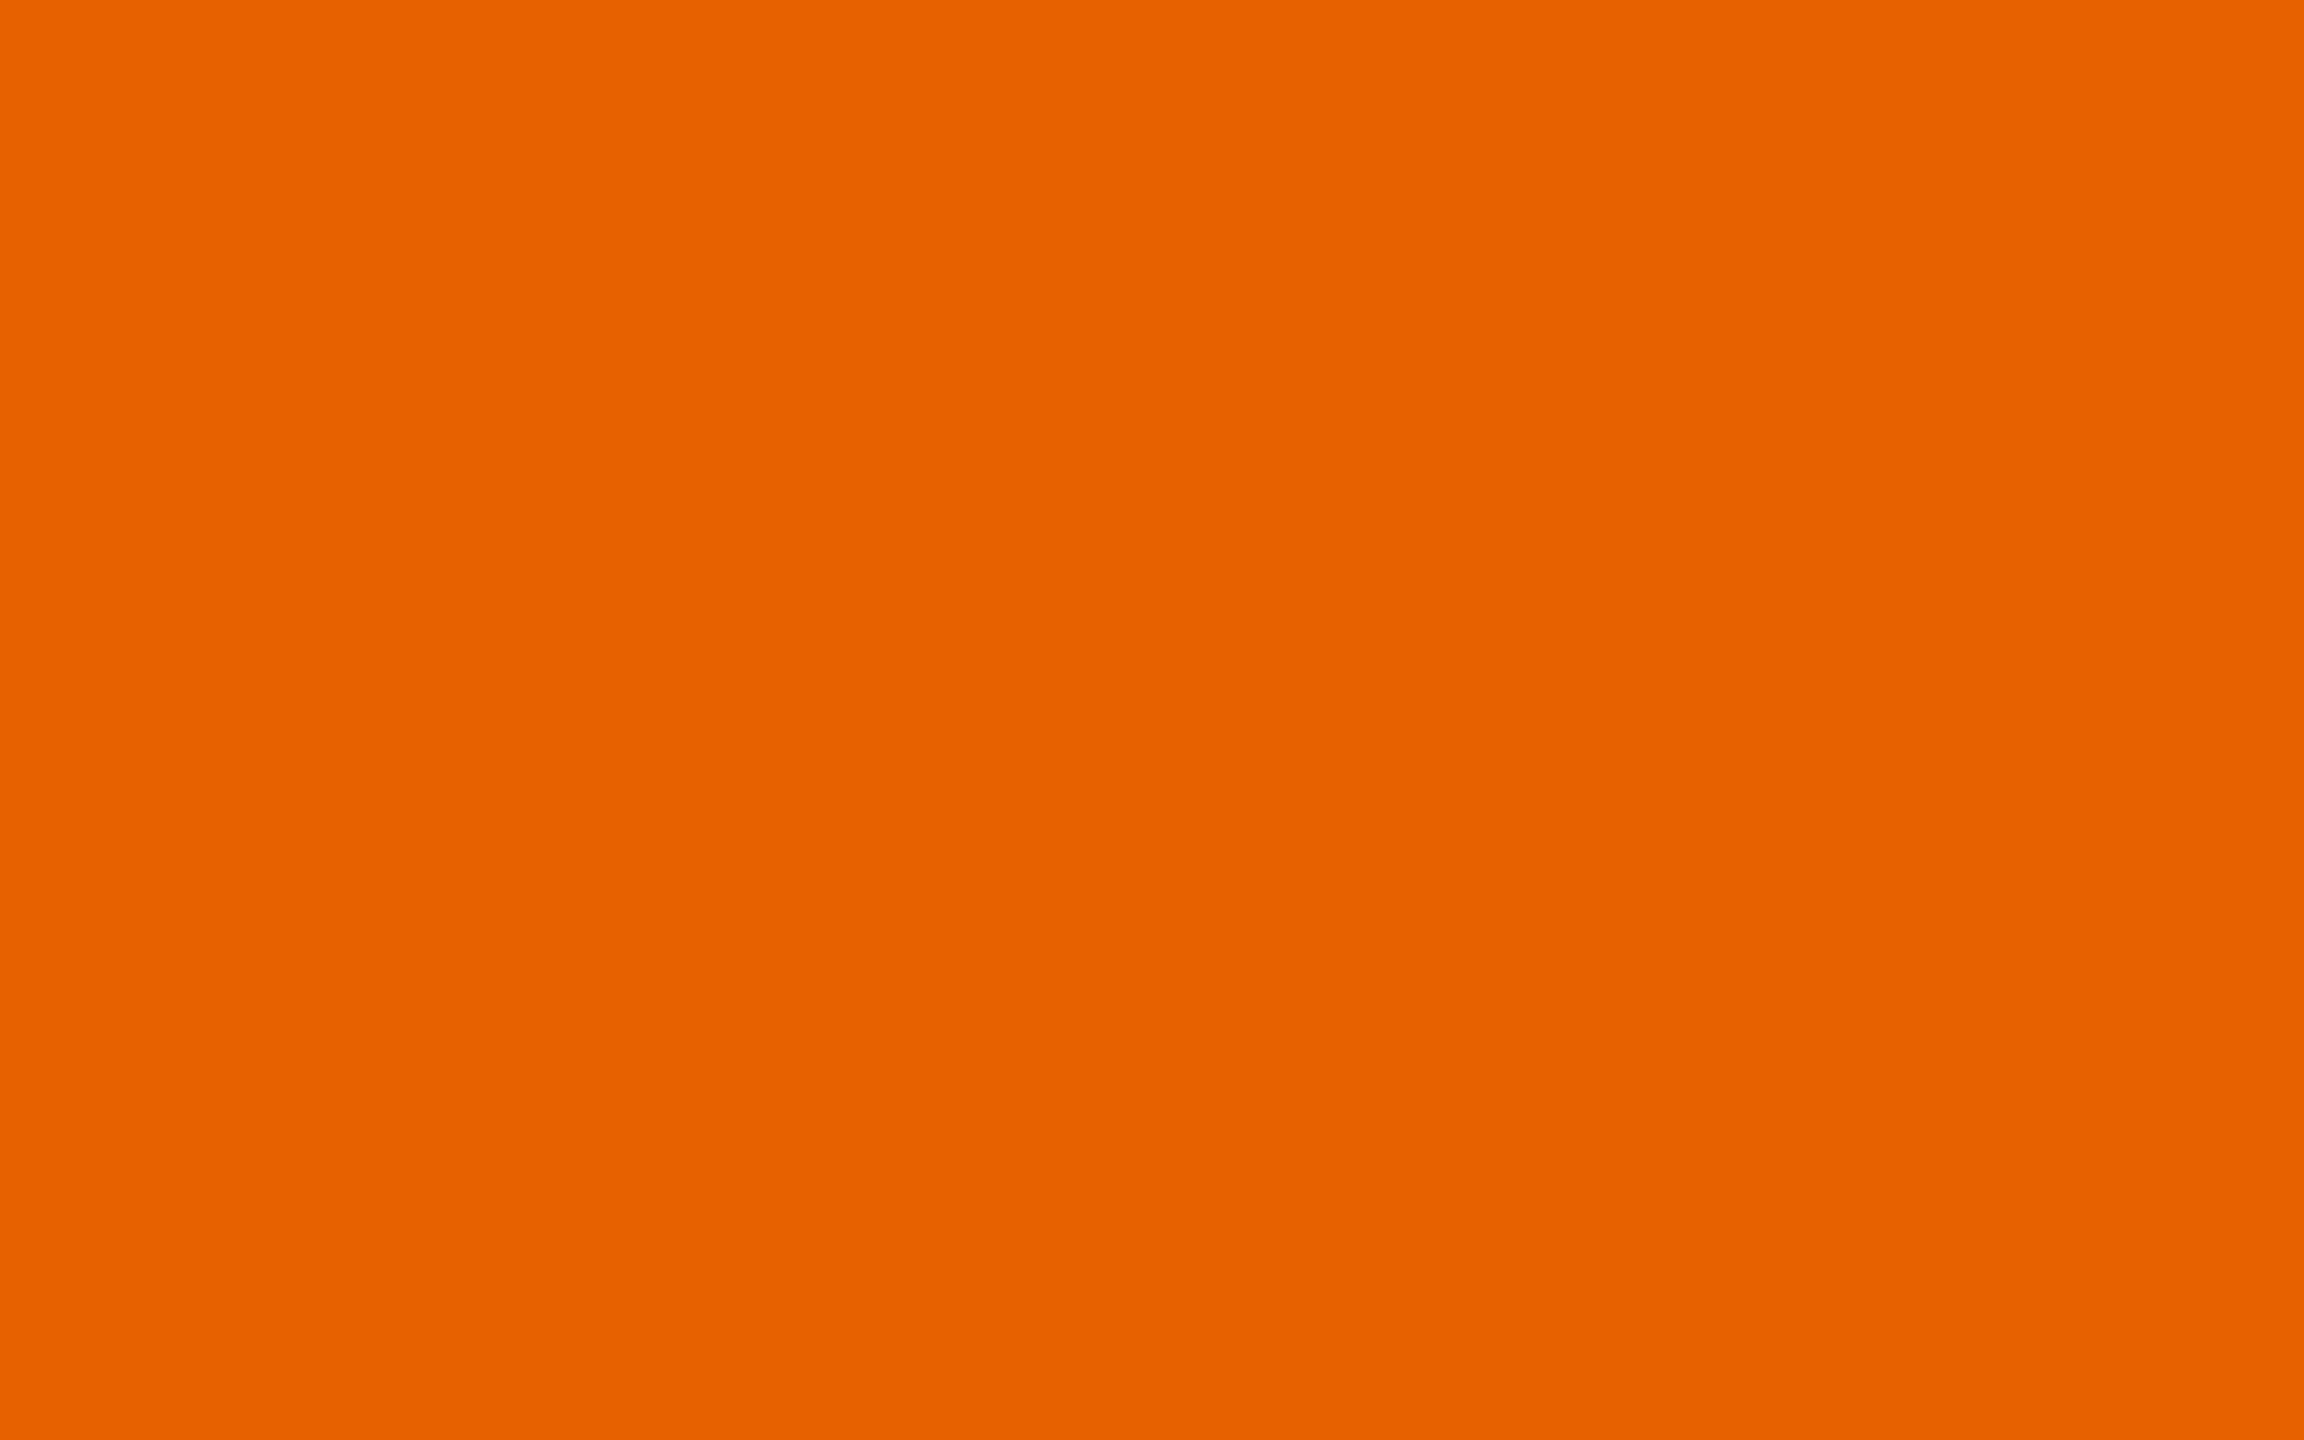 2304x1440 Spanish Orange Solid Color Background